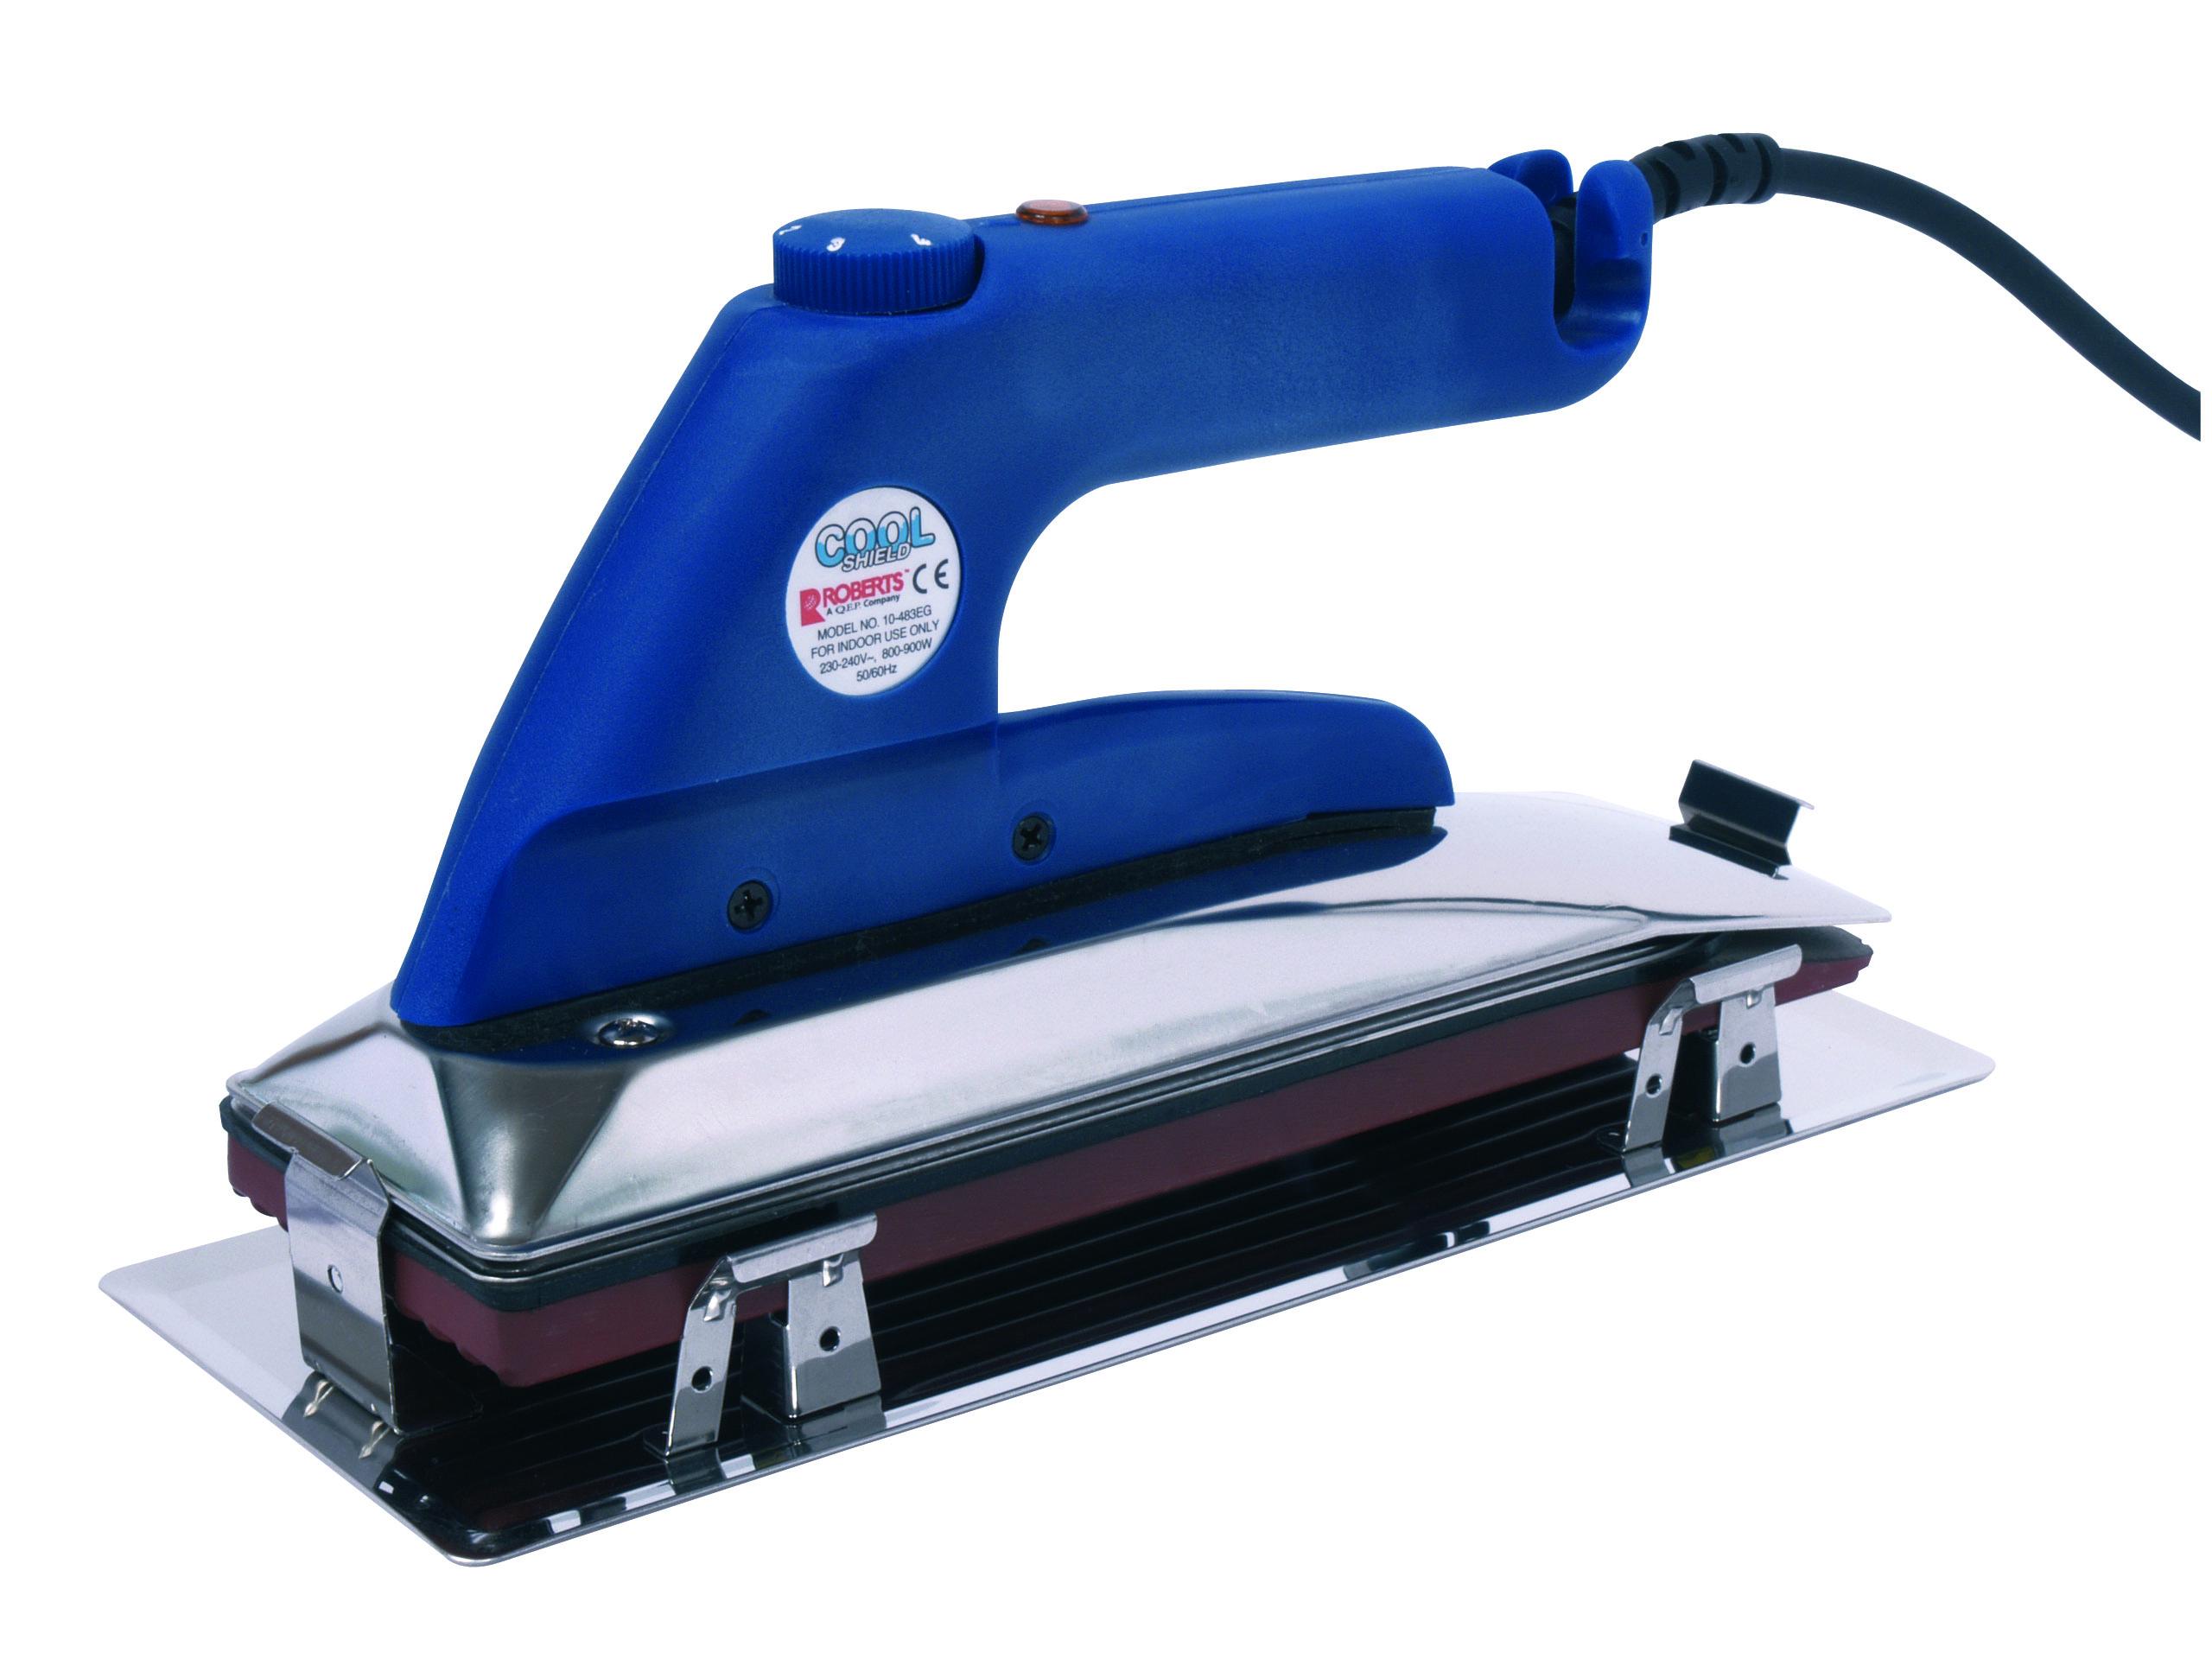 Cool Shield ® Heat Bond Seaming Iron